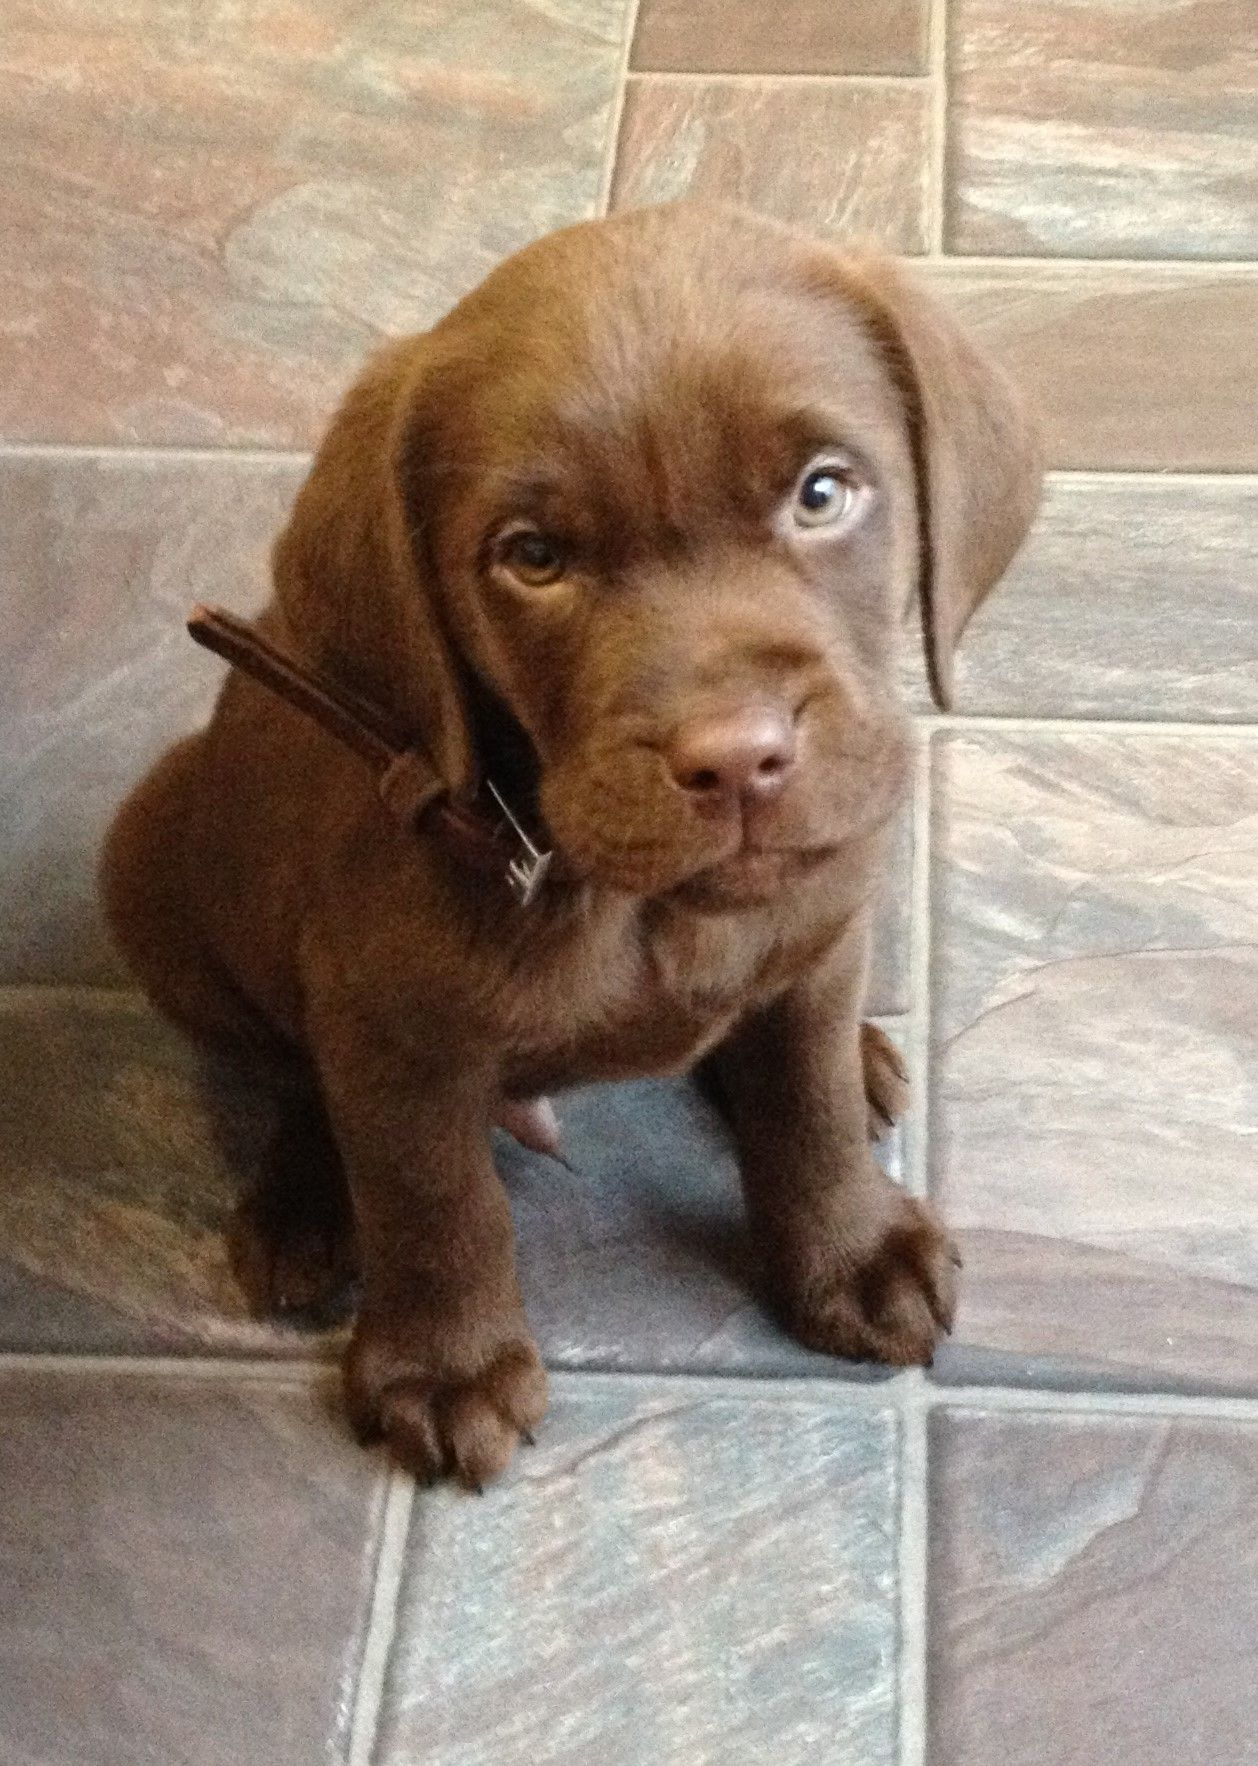 Chocolate Labrador Puppy Chocolate Lab Puppy Labrador Puppy Cute Animals Labrador Puppy Chocolate